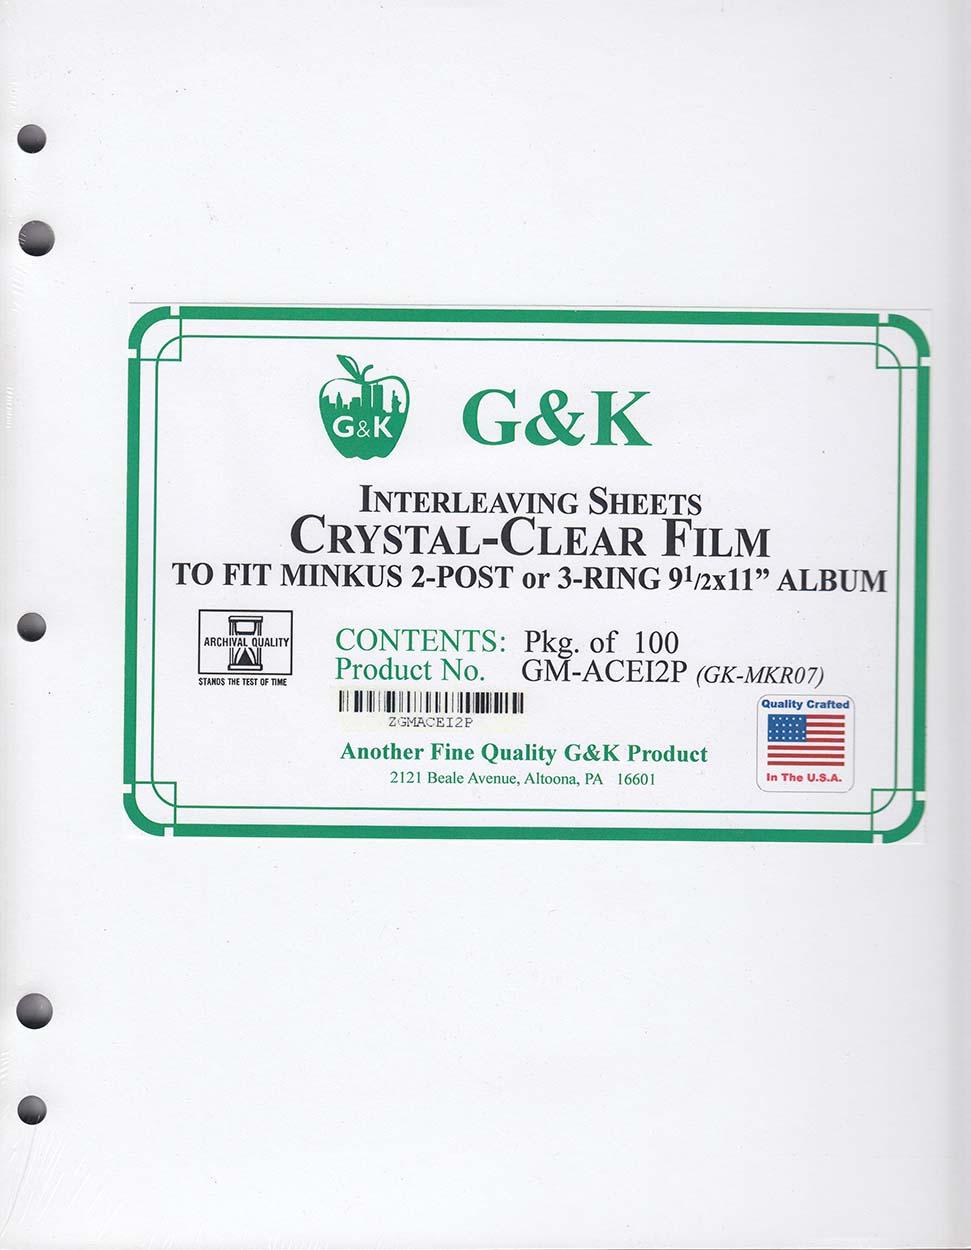 G&K Crystal Clear Interleaving -- Minkus Albums